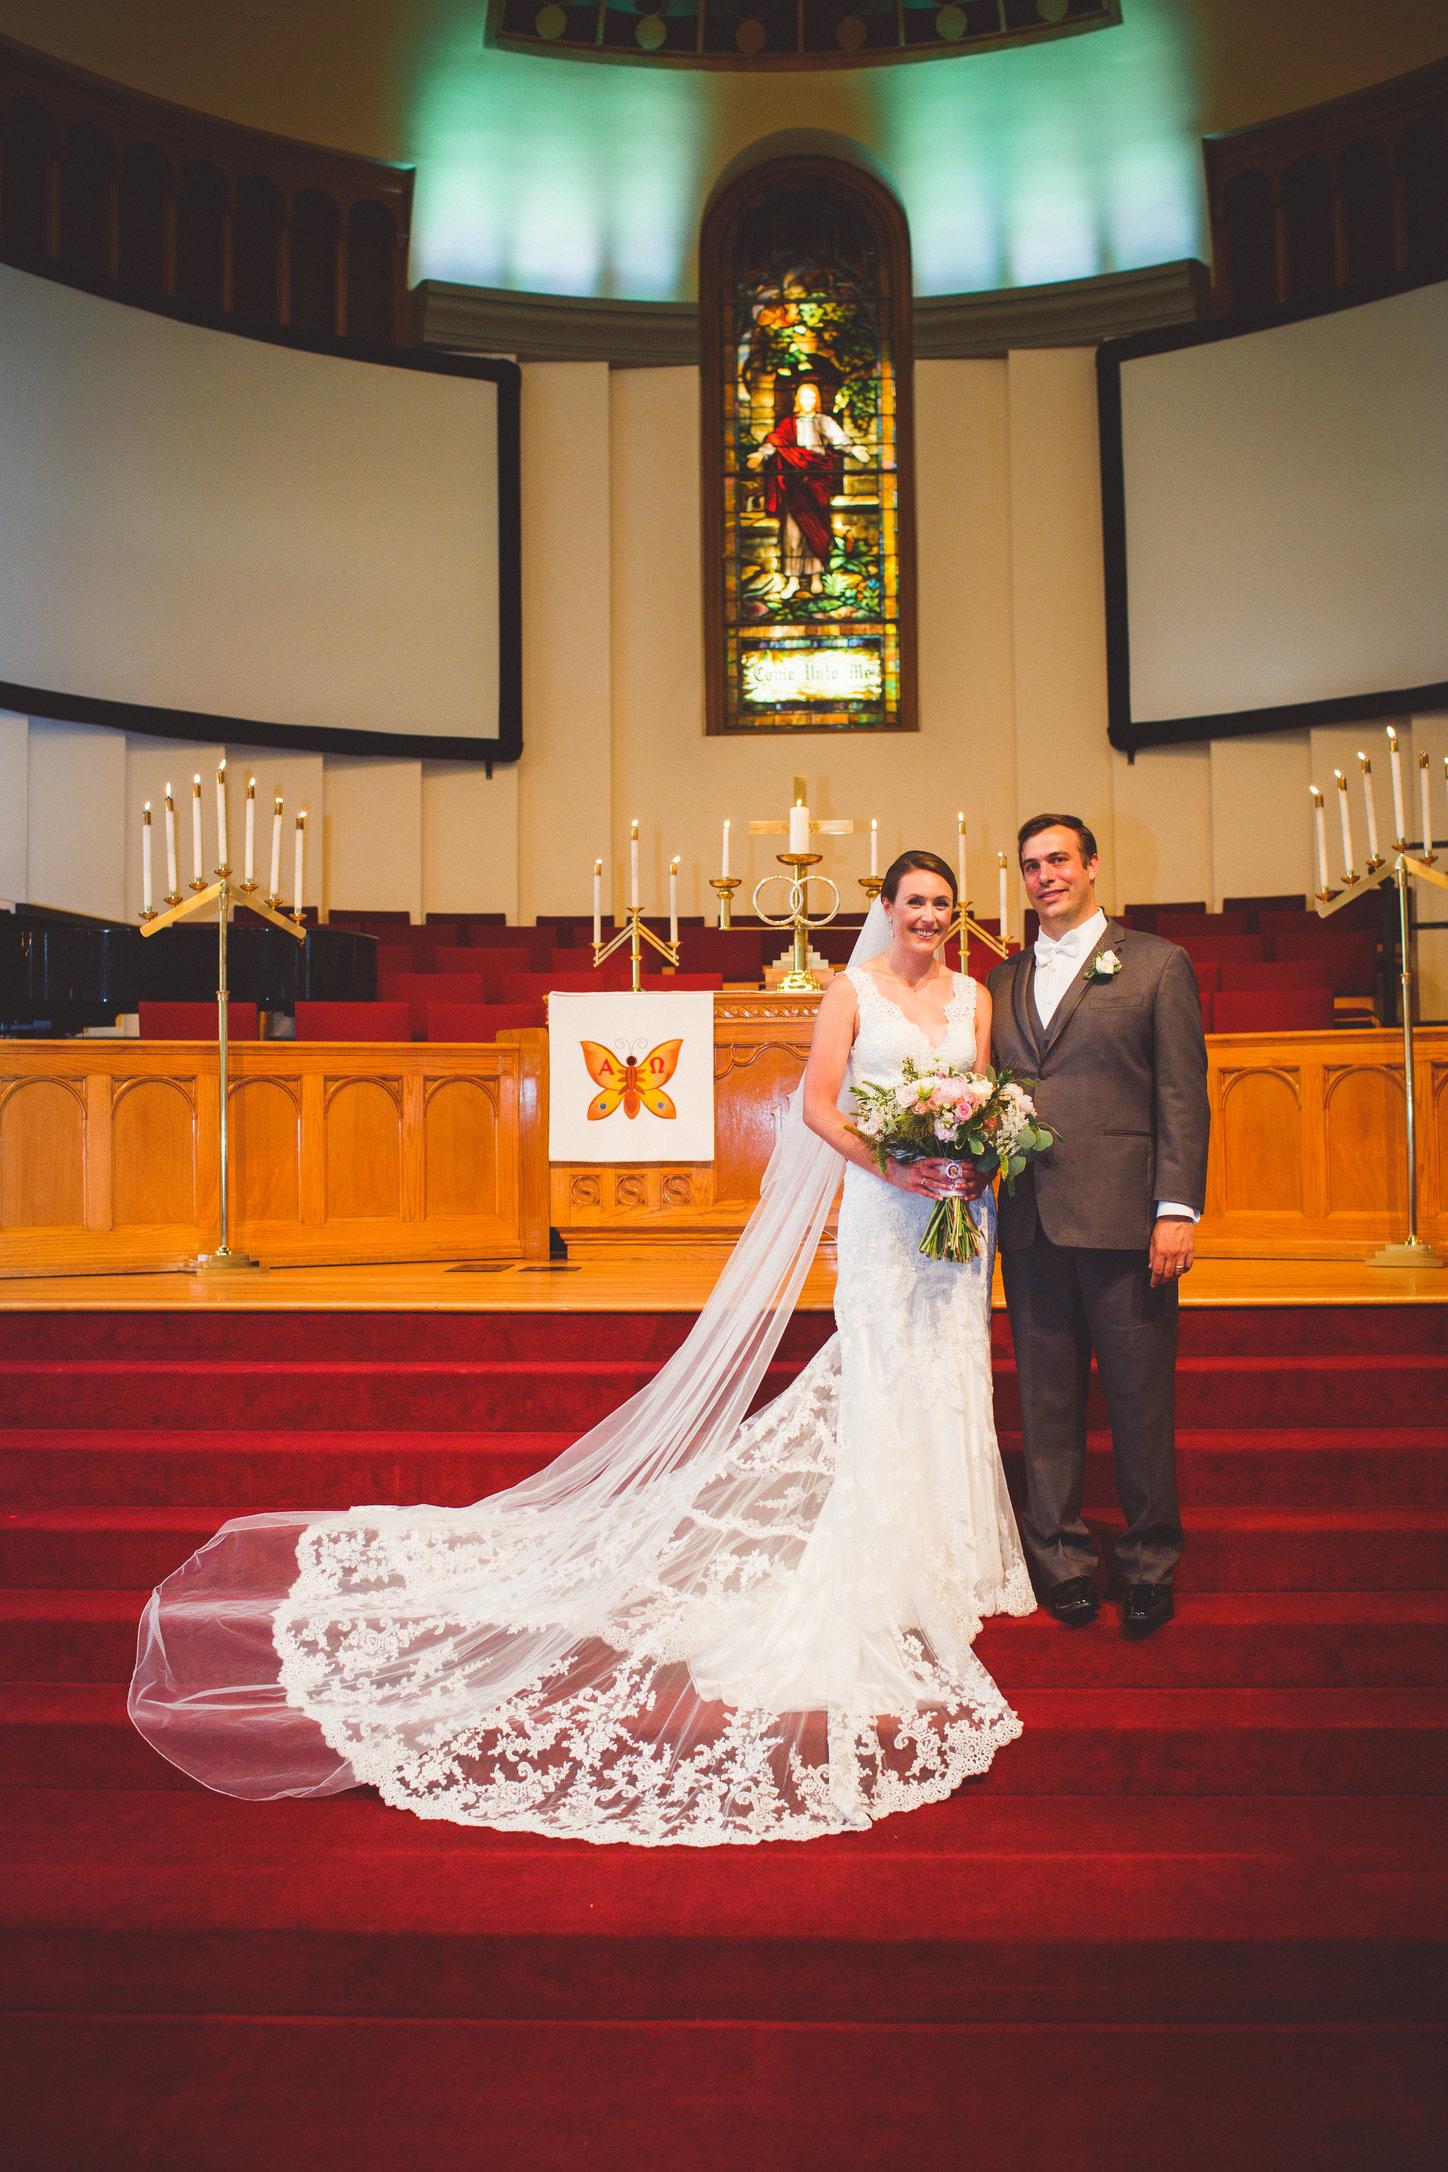 SandC-wedding-296.jpg